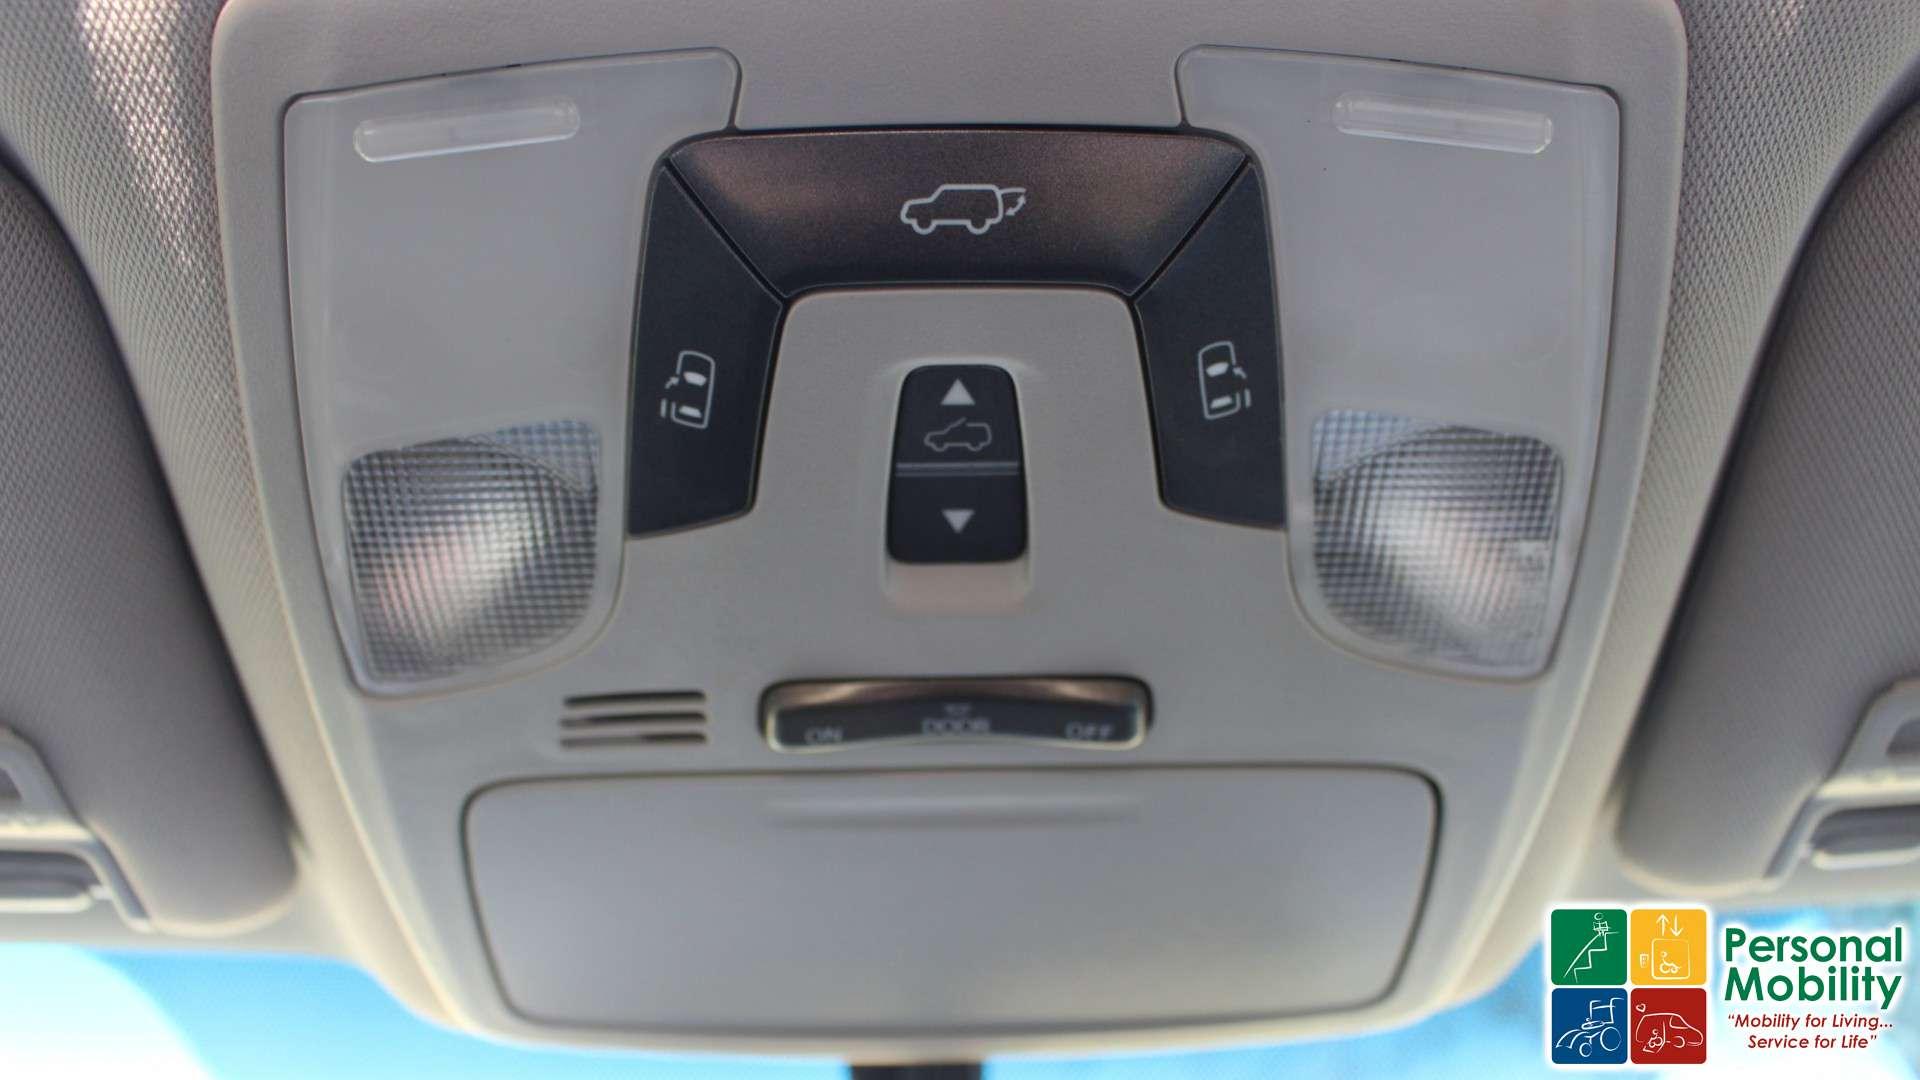 2015 Toyota Sienna | Stock: FS662392 | Wheelchair Van For Sale